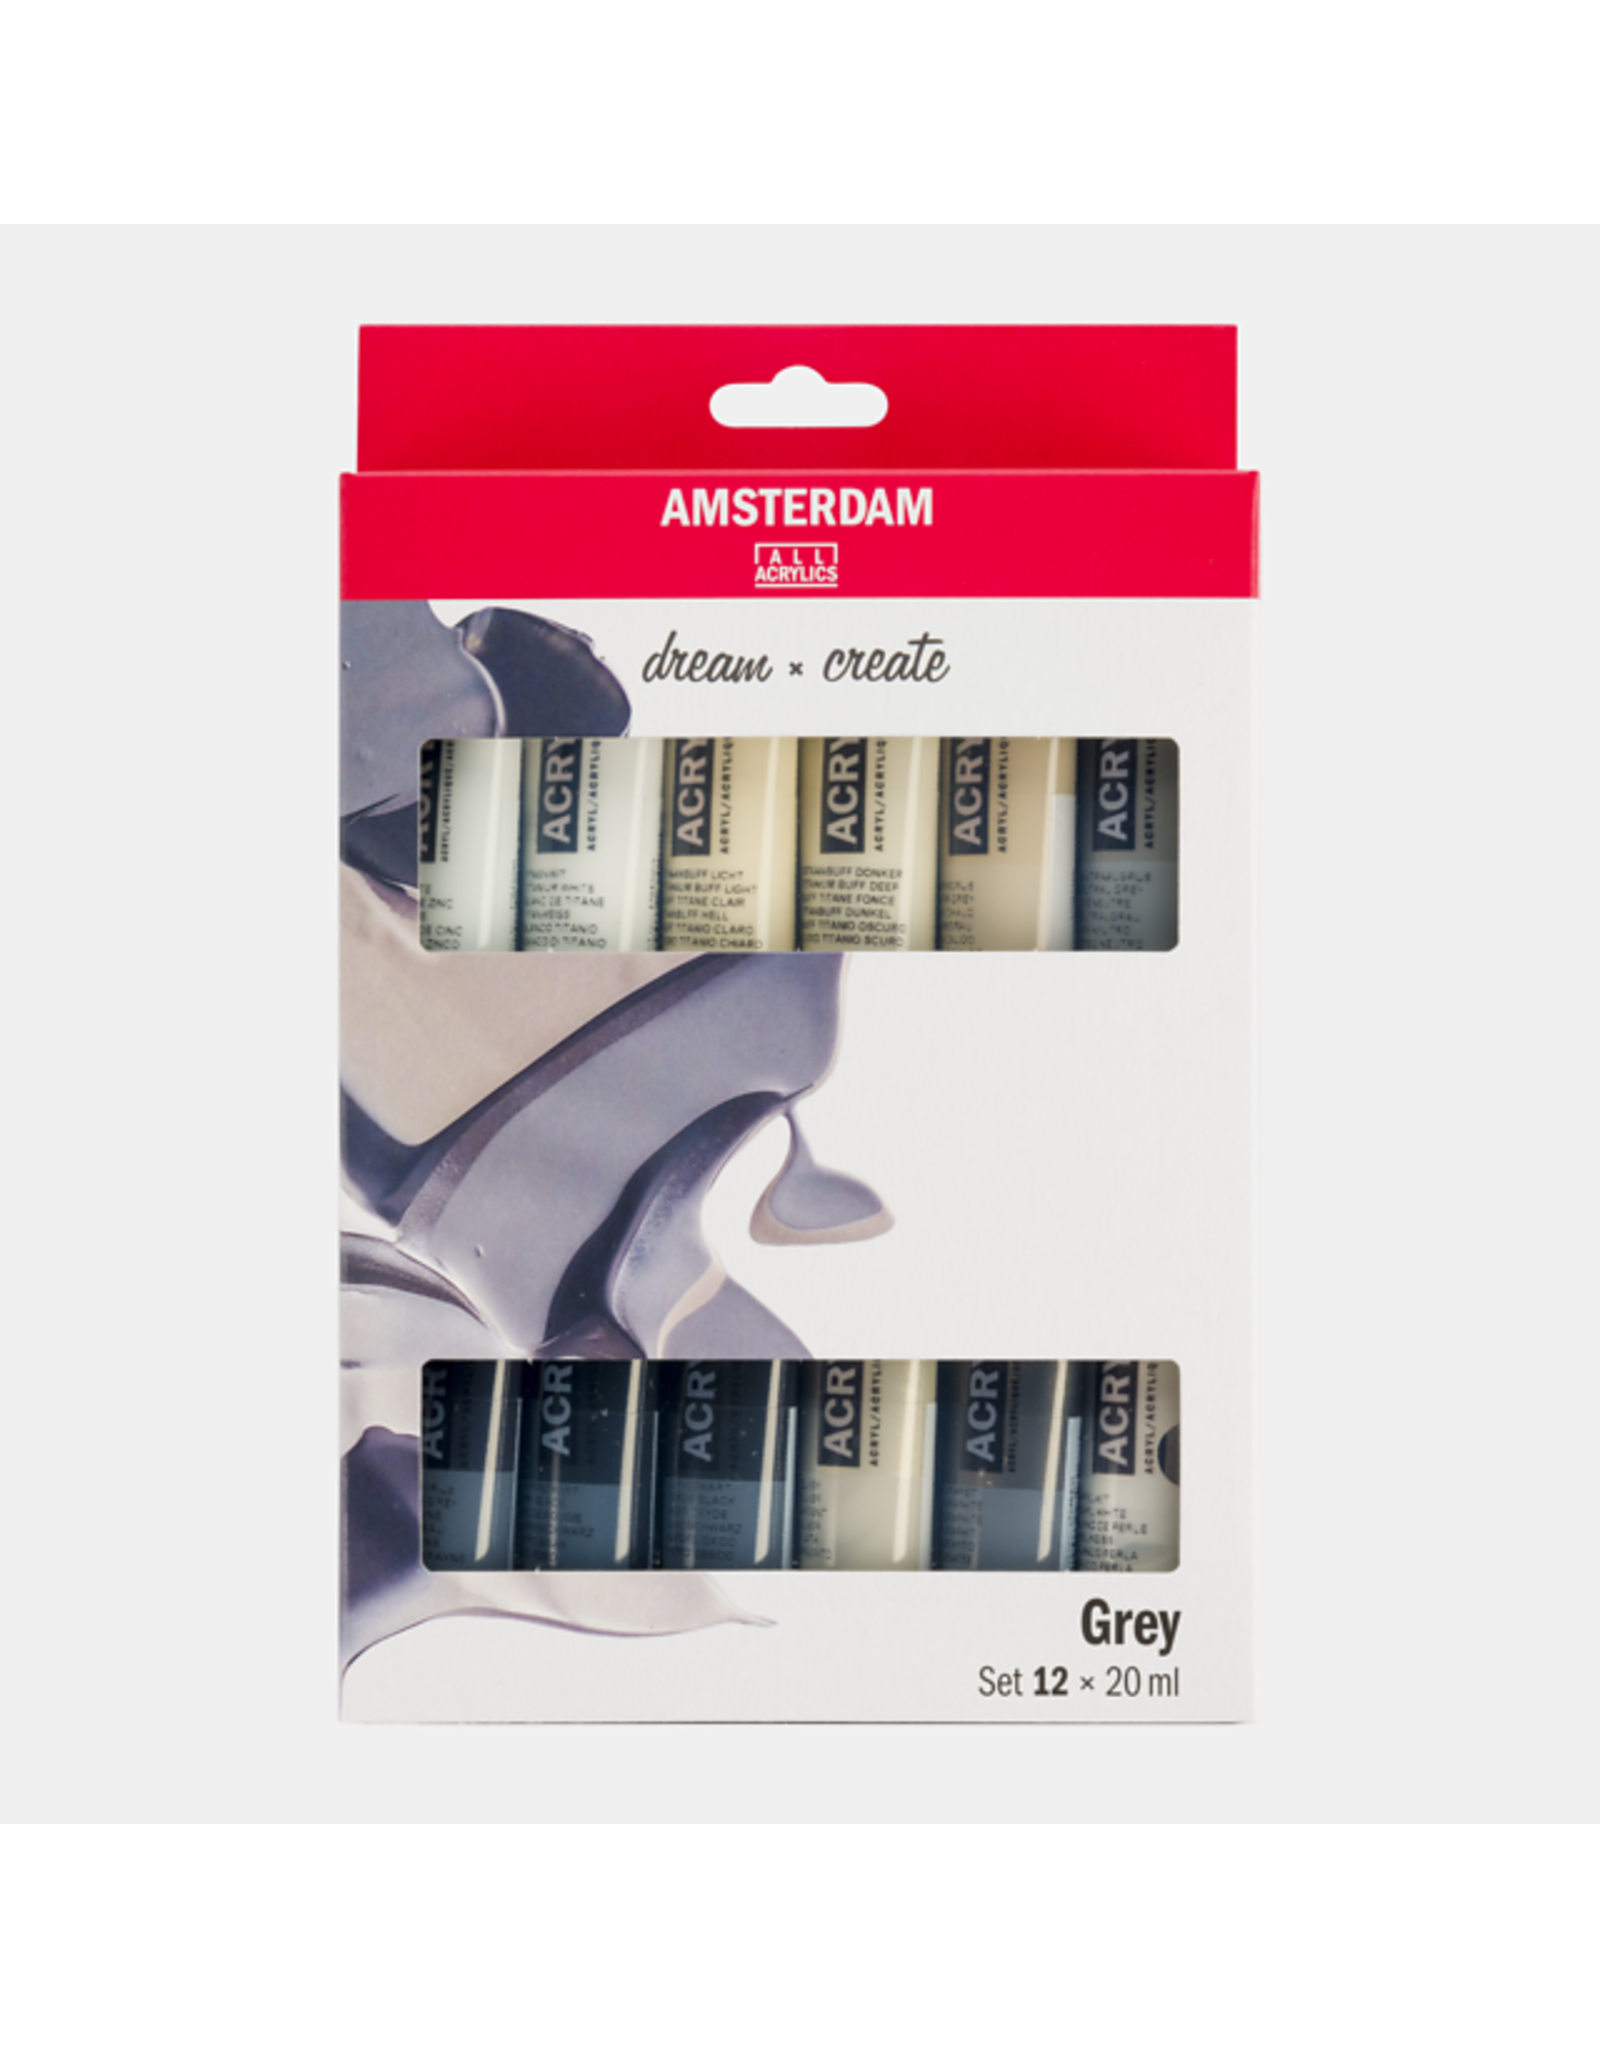 Grey set 12x20ml